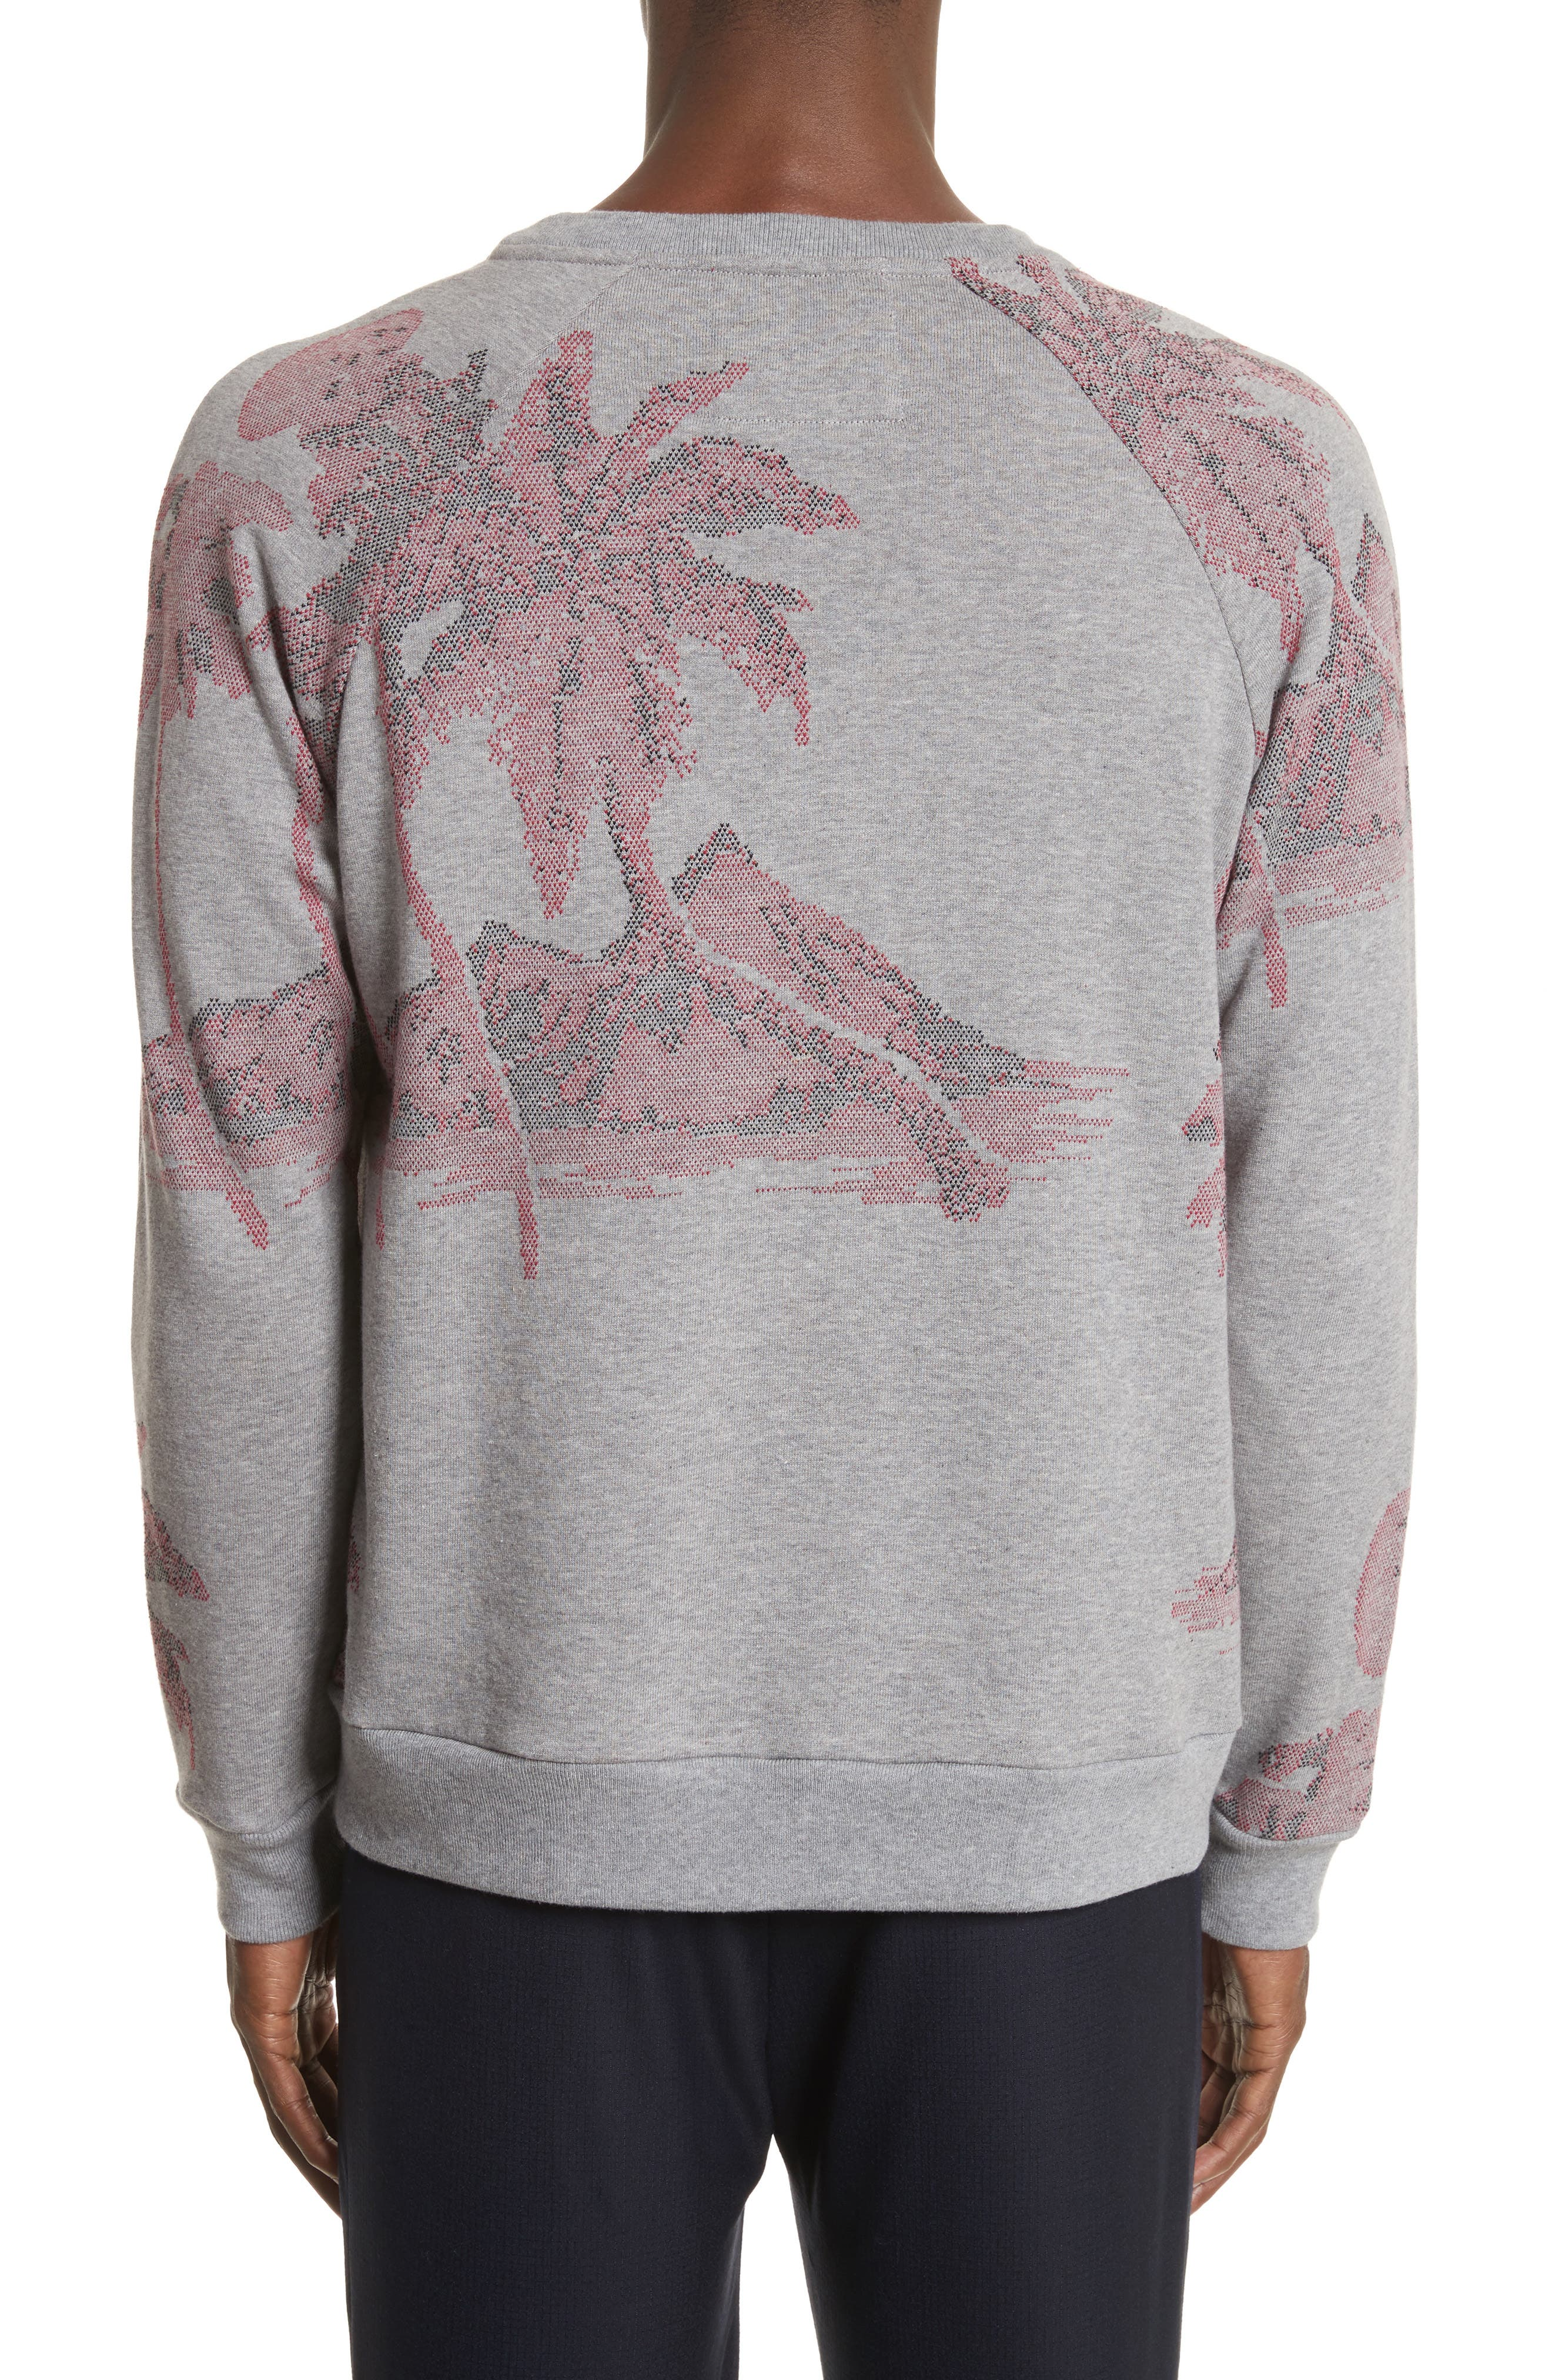 Crewneck Sweatshirt,                             Alternate thumbnail 2, color,                             24 Grey